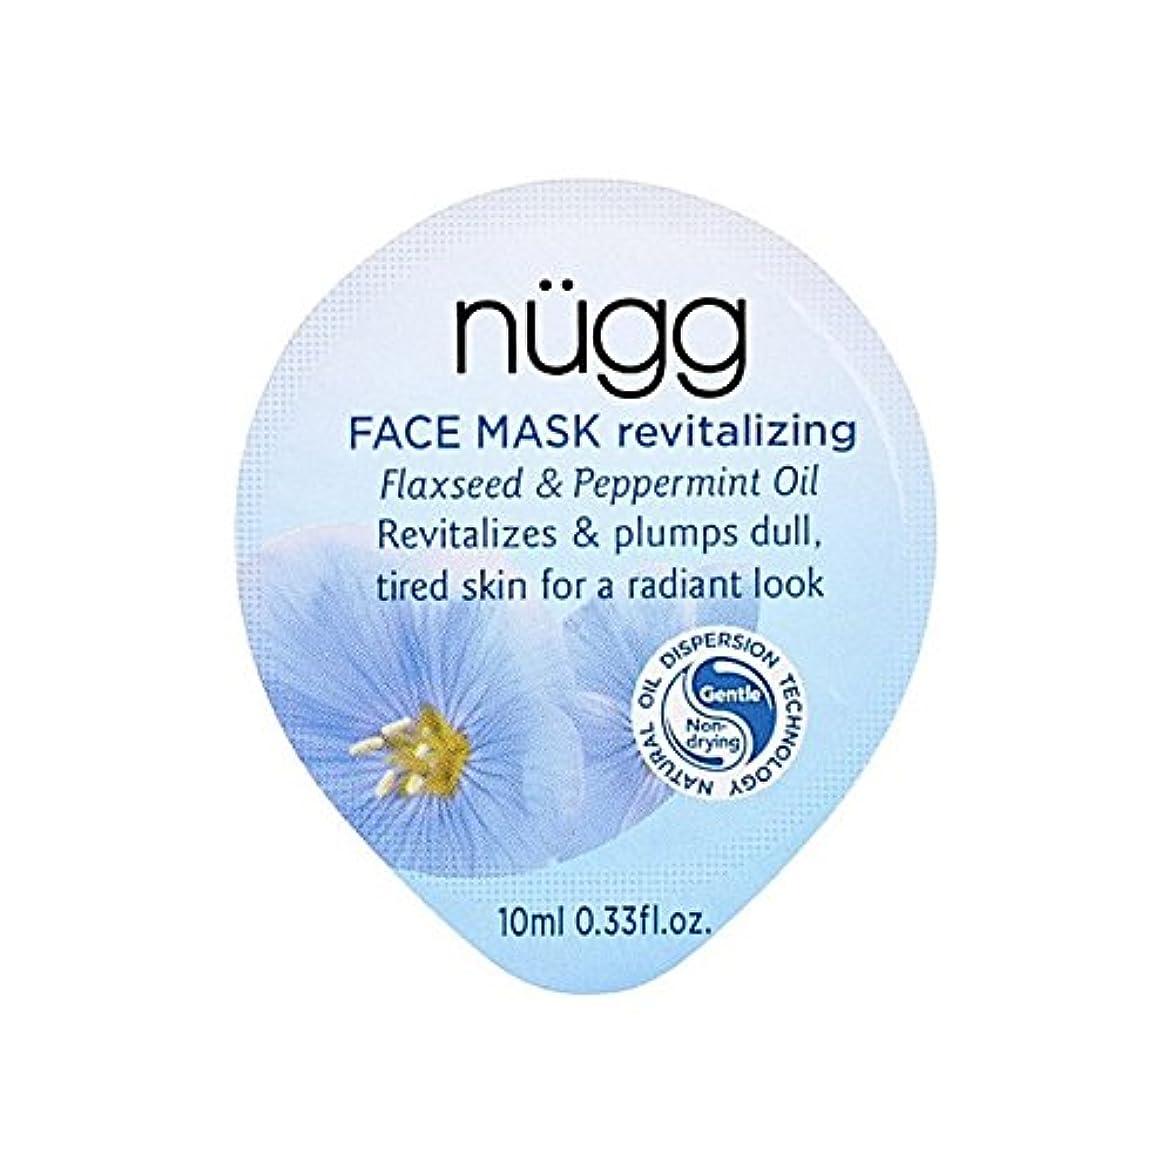 Nugg Revitalizing Face Mask - フェイスマスクを活性化 [並行輸入品]